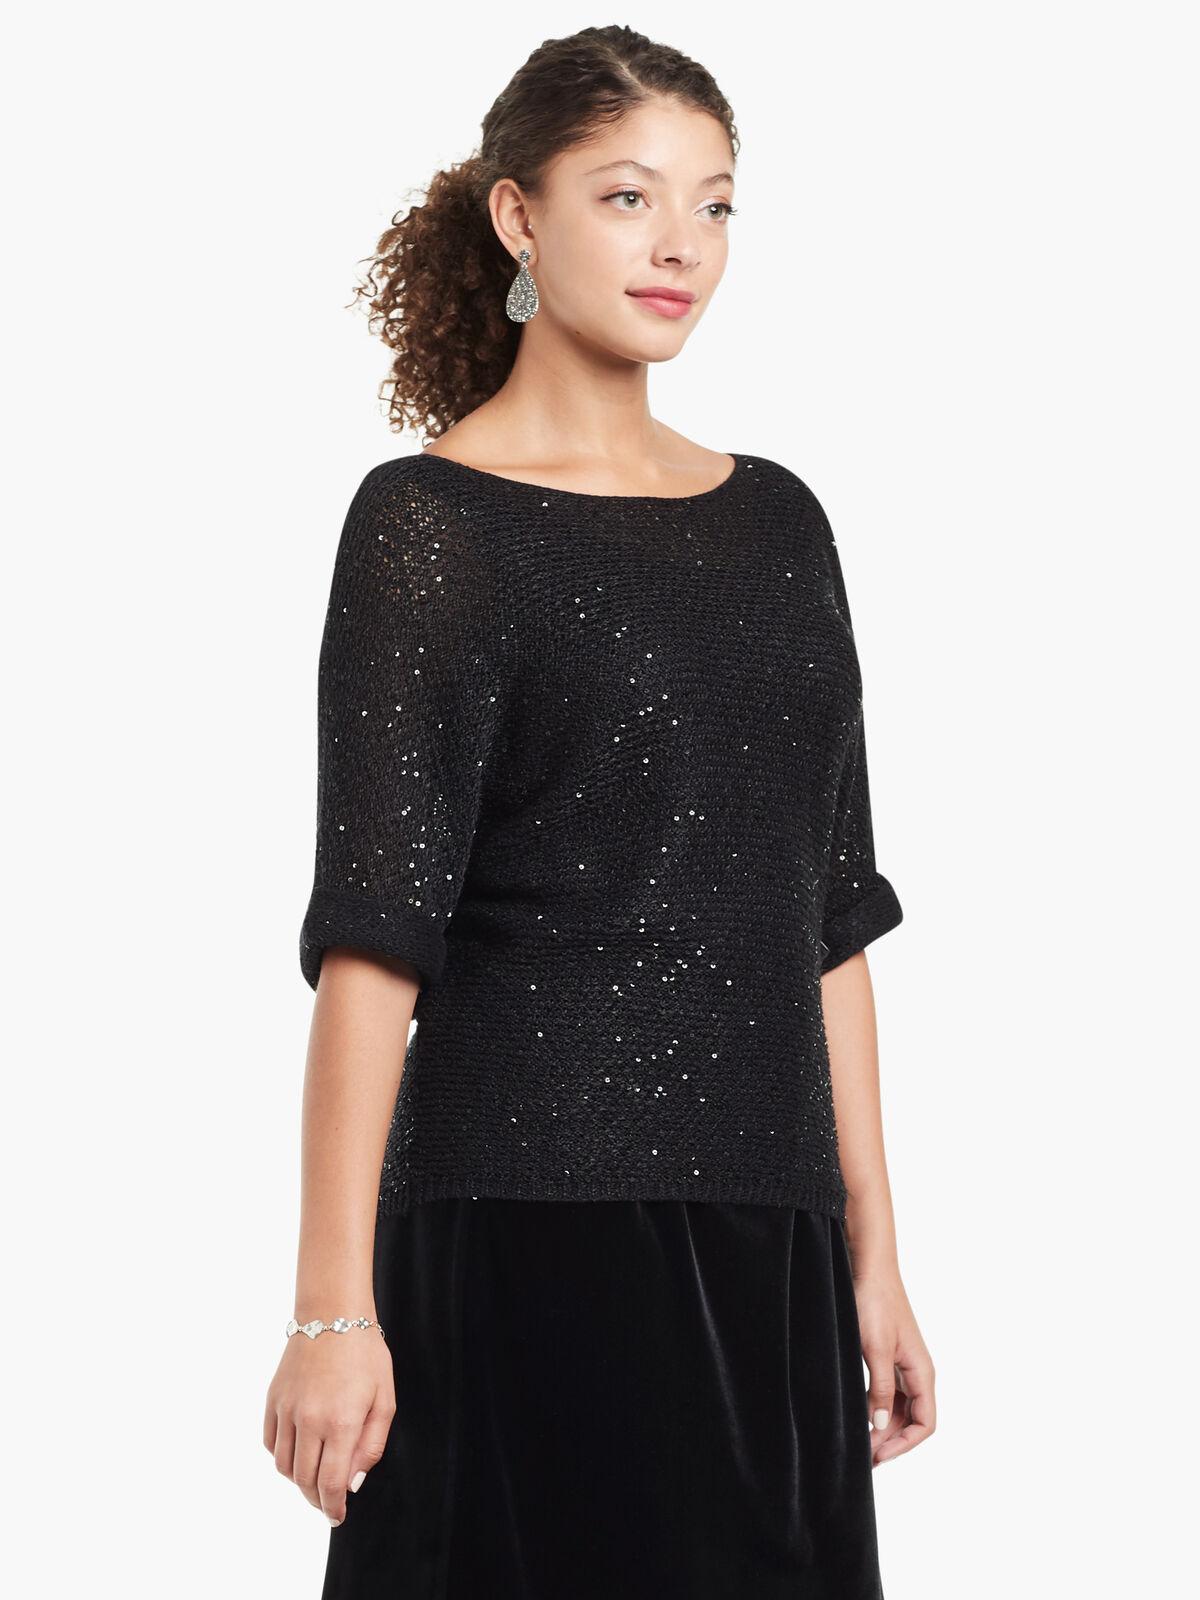 Stargazing Sweater